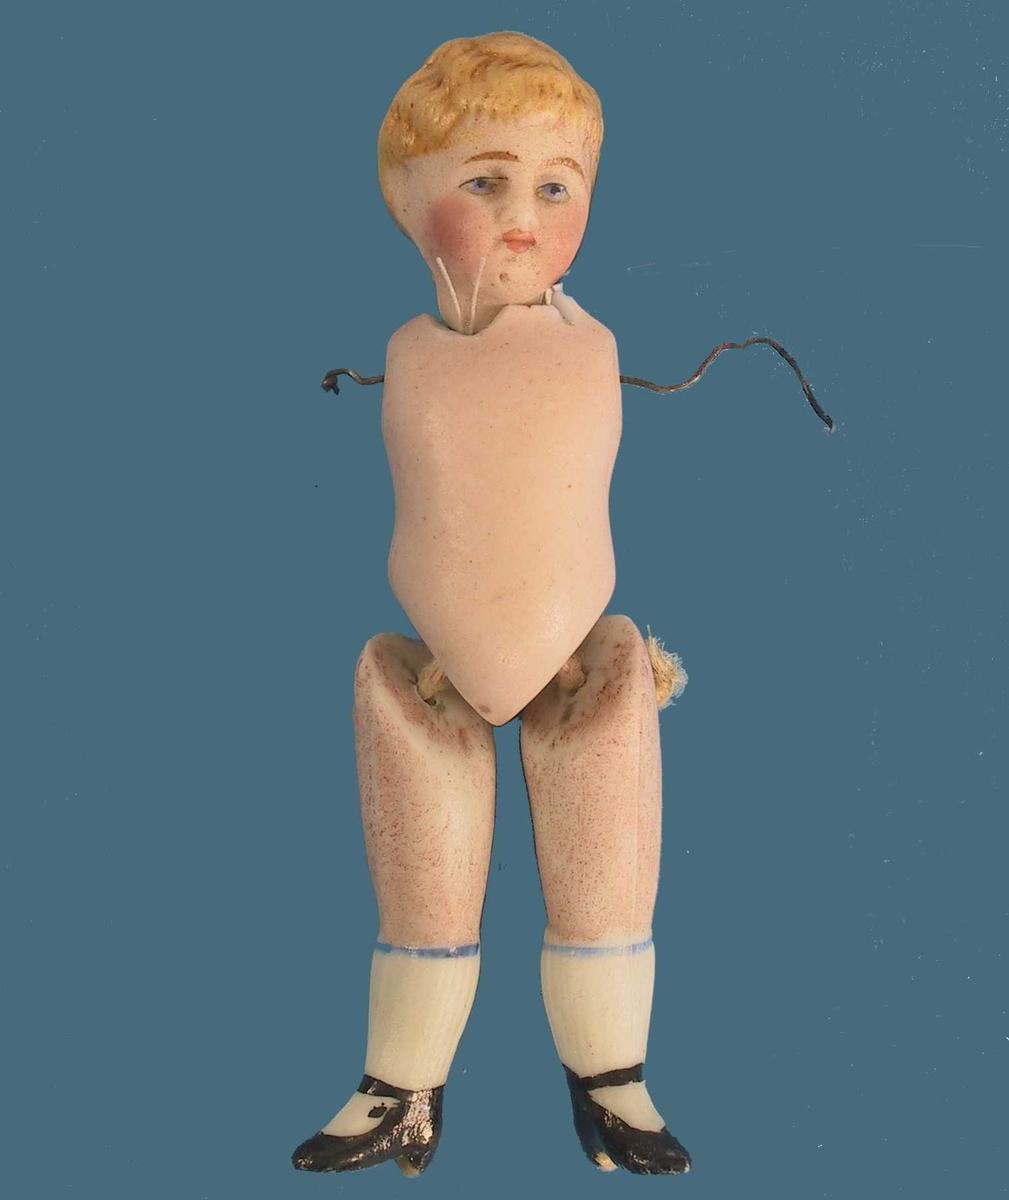 Form: Hode festet til kropp med ståltråd, armer mangler. Ben festet til krop med ulltråd.